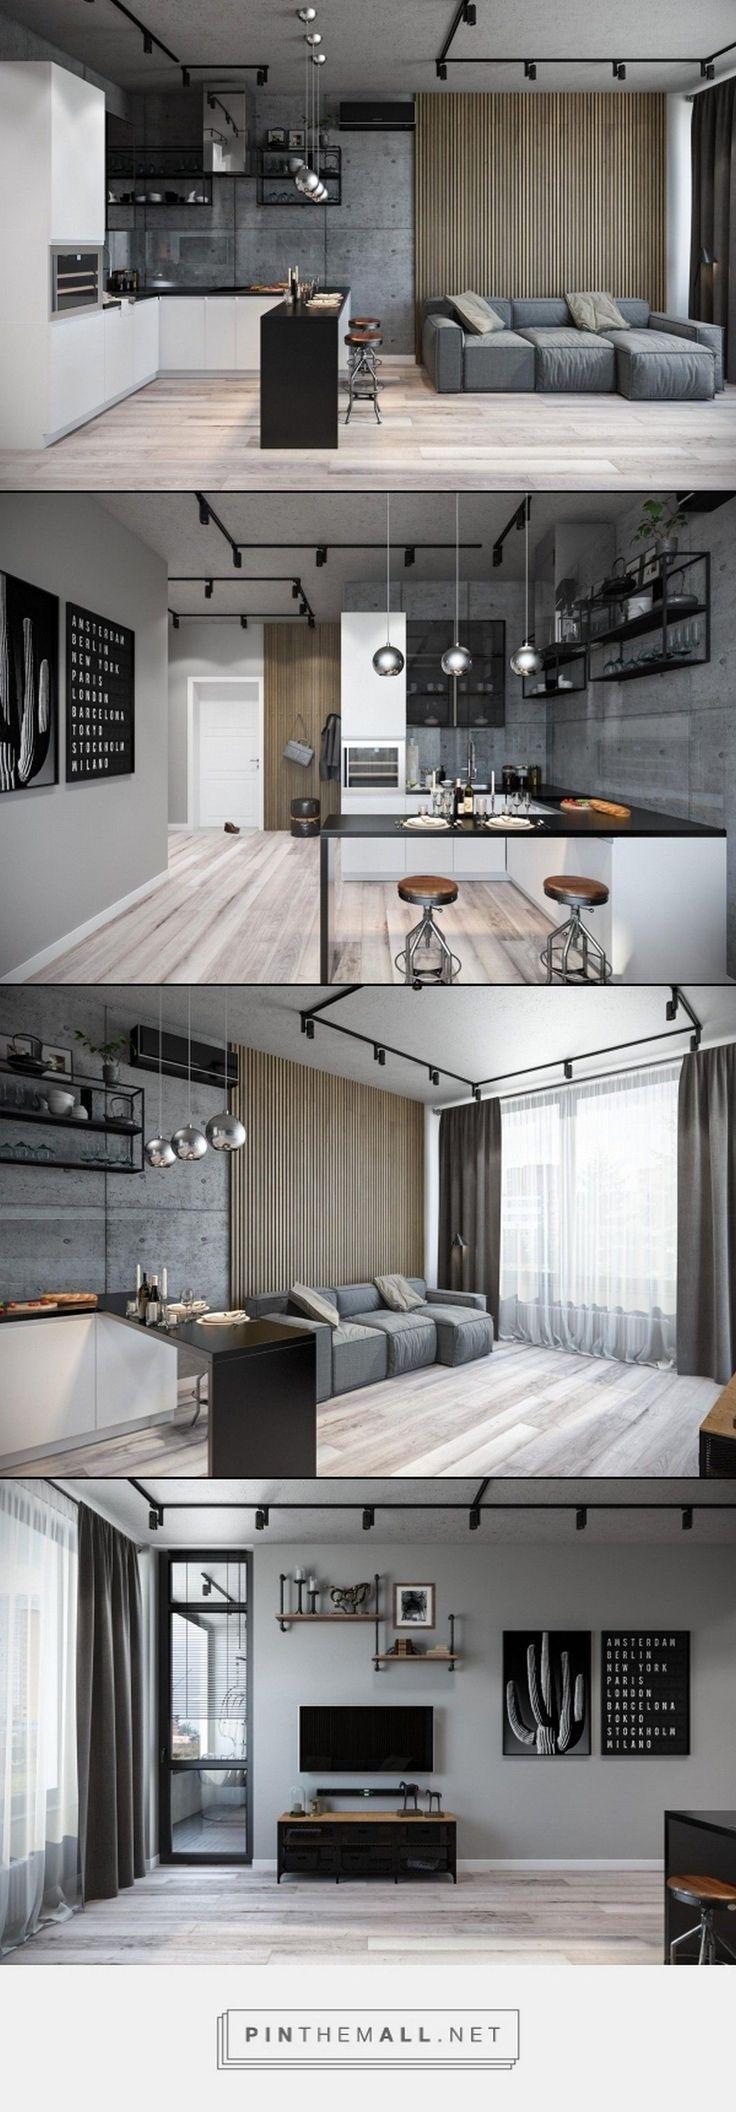 Home Decorating Ideas Living Room 15 Perfect and Cozy Small Living Room Design www.decomagz.com/…